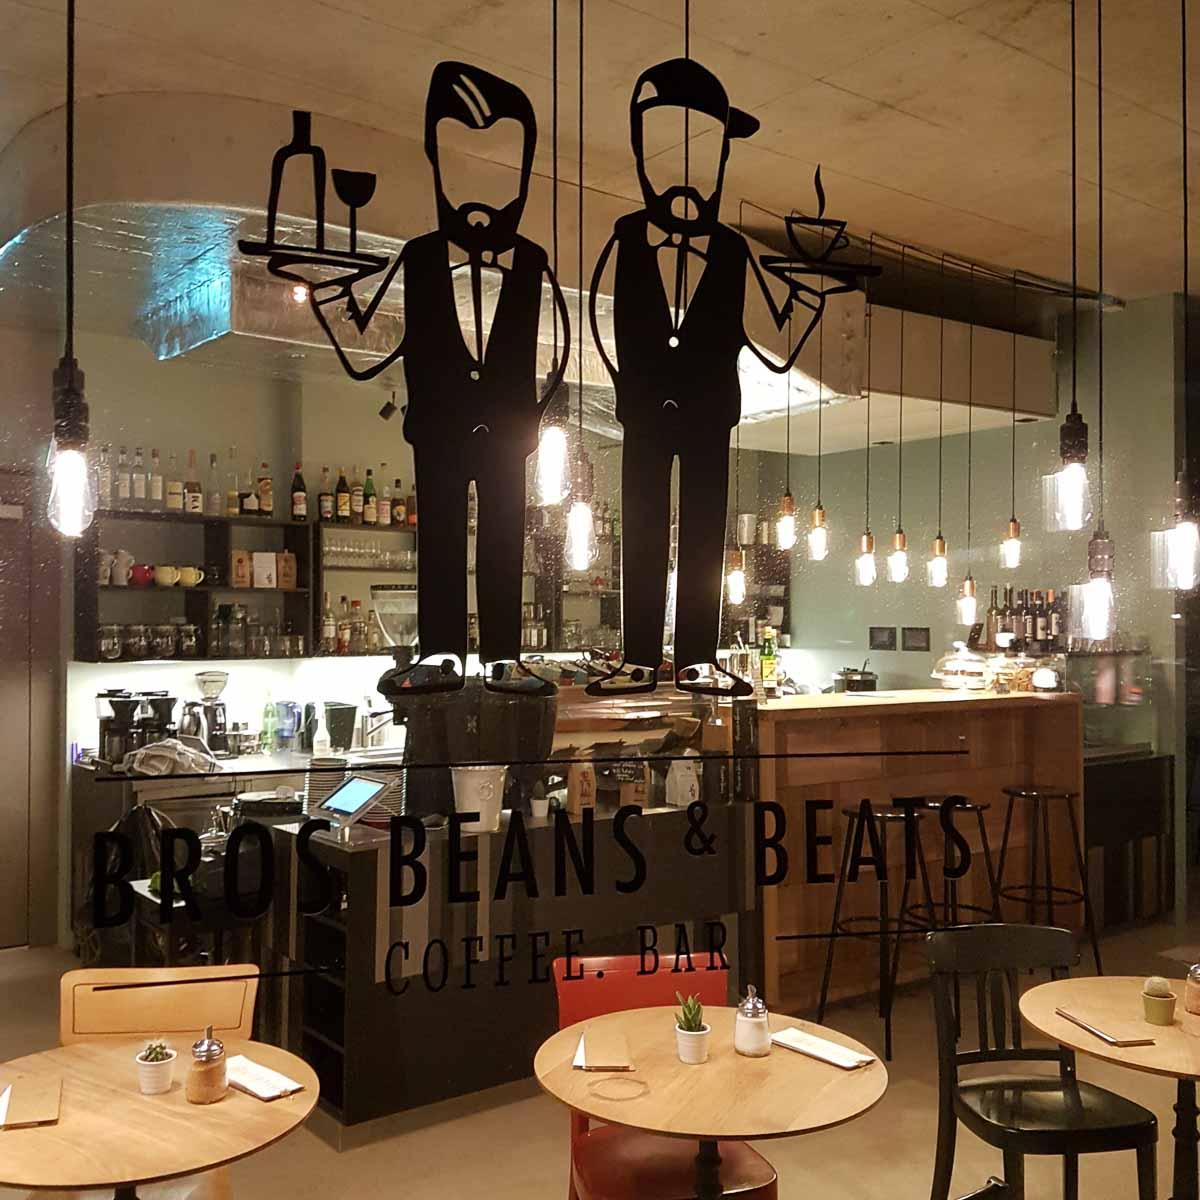 Bros Beans & Beats Café und Bar in Zürich